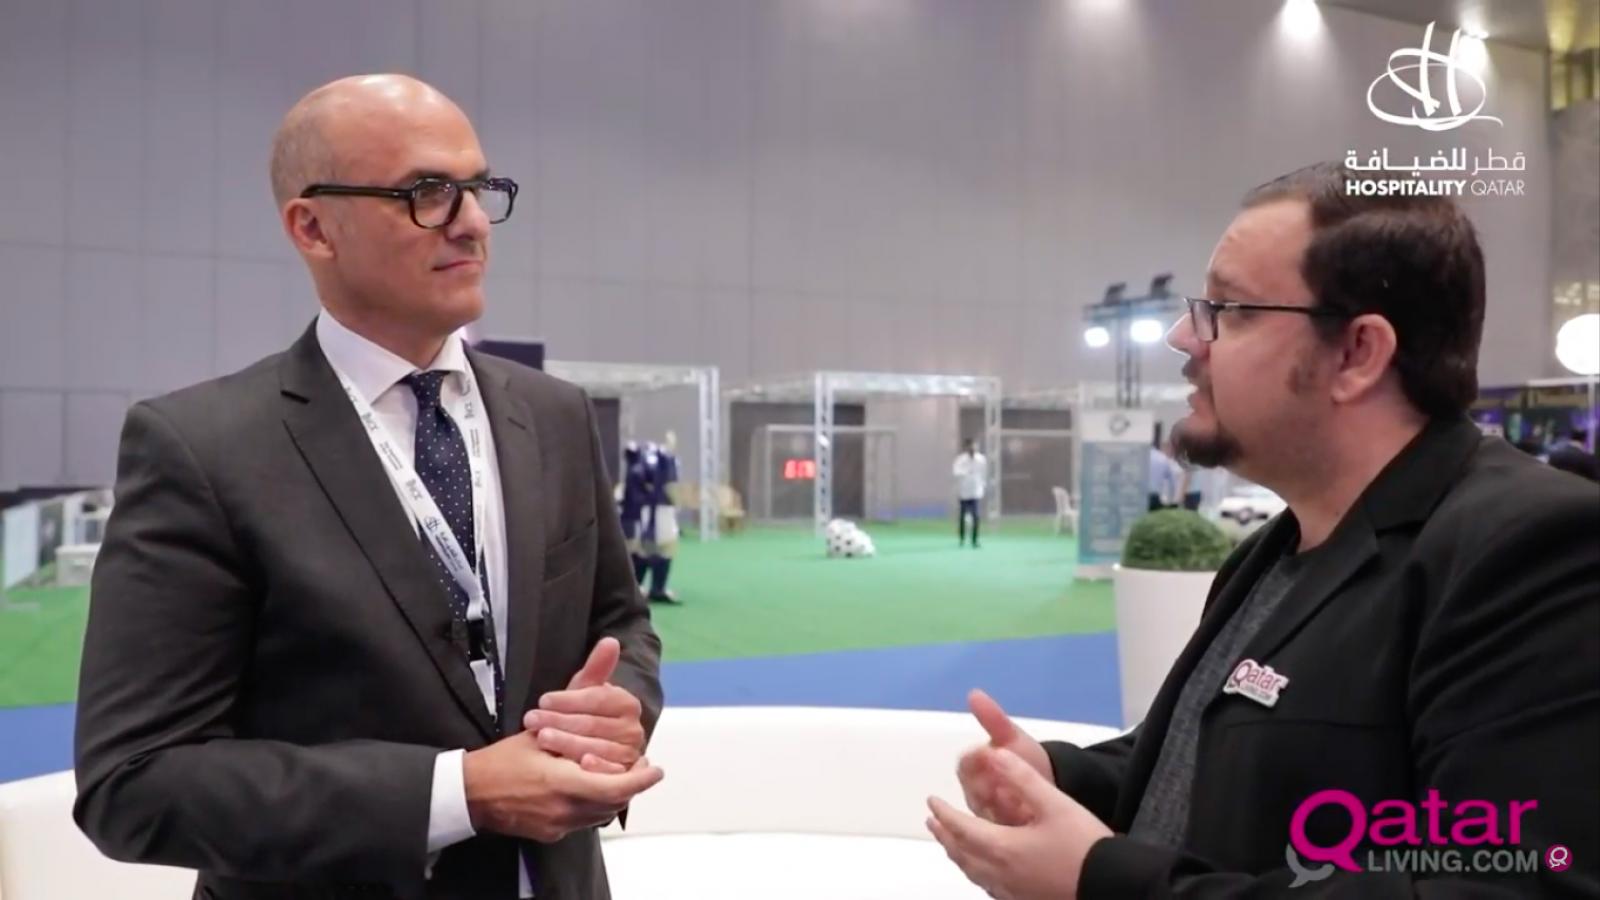 WATCH: Qatar Living chats with Javier Martinez at Hospitality Qatar 2019